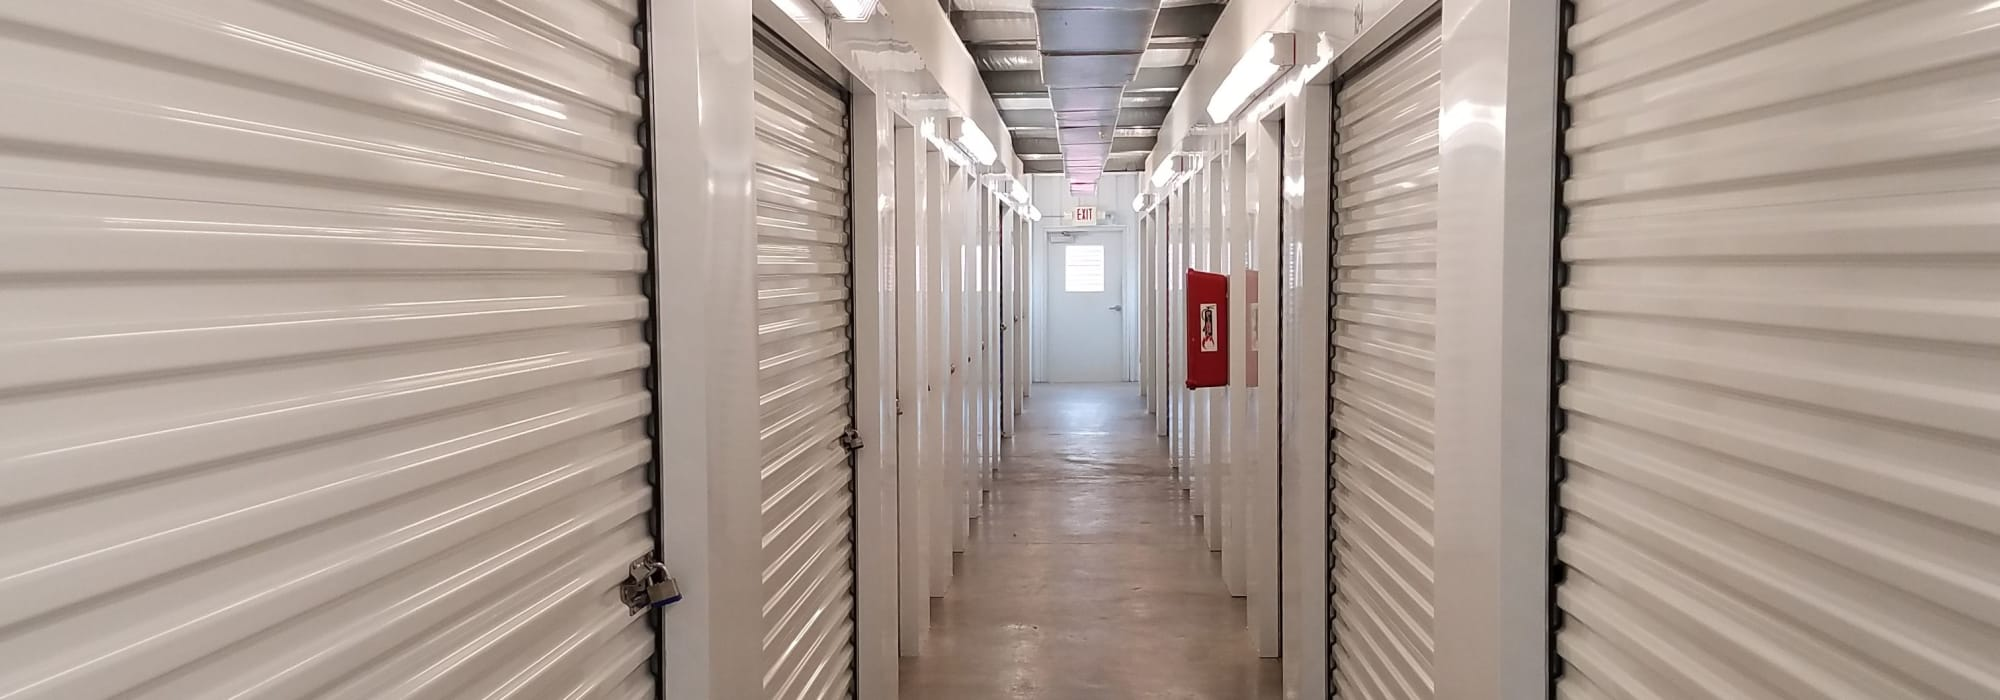 Self storage in Savannah GA